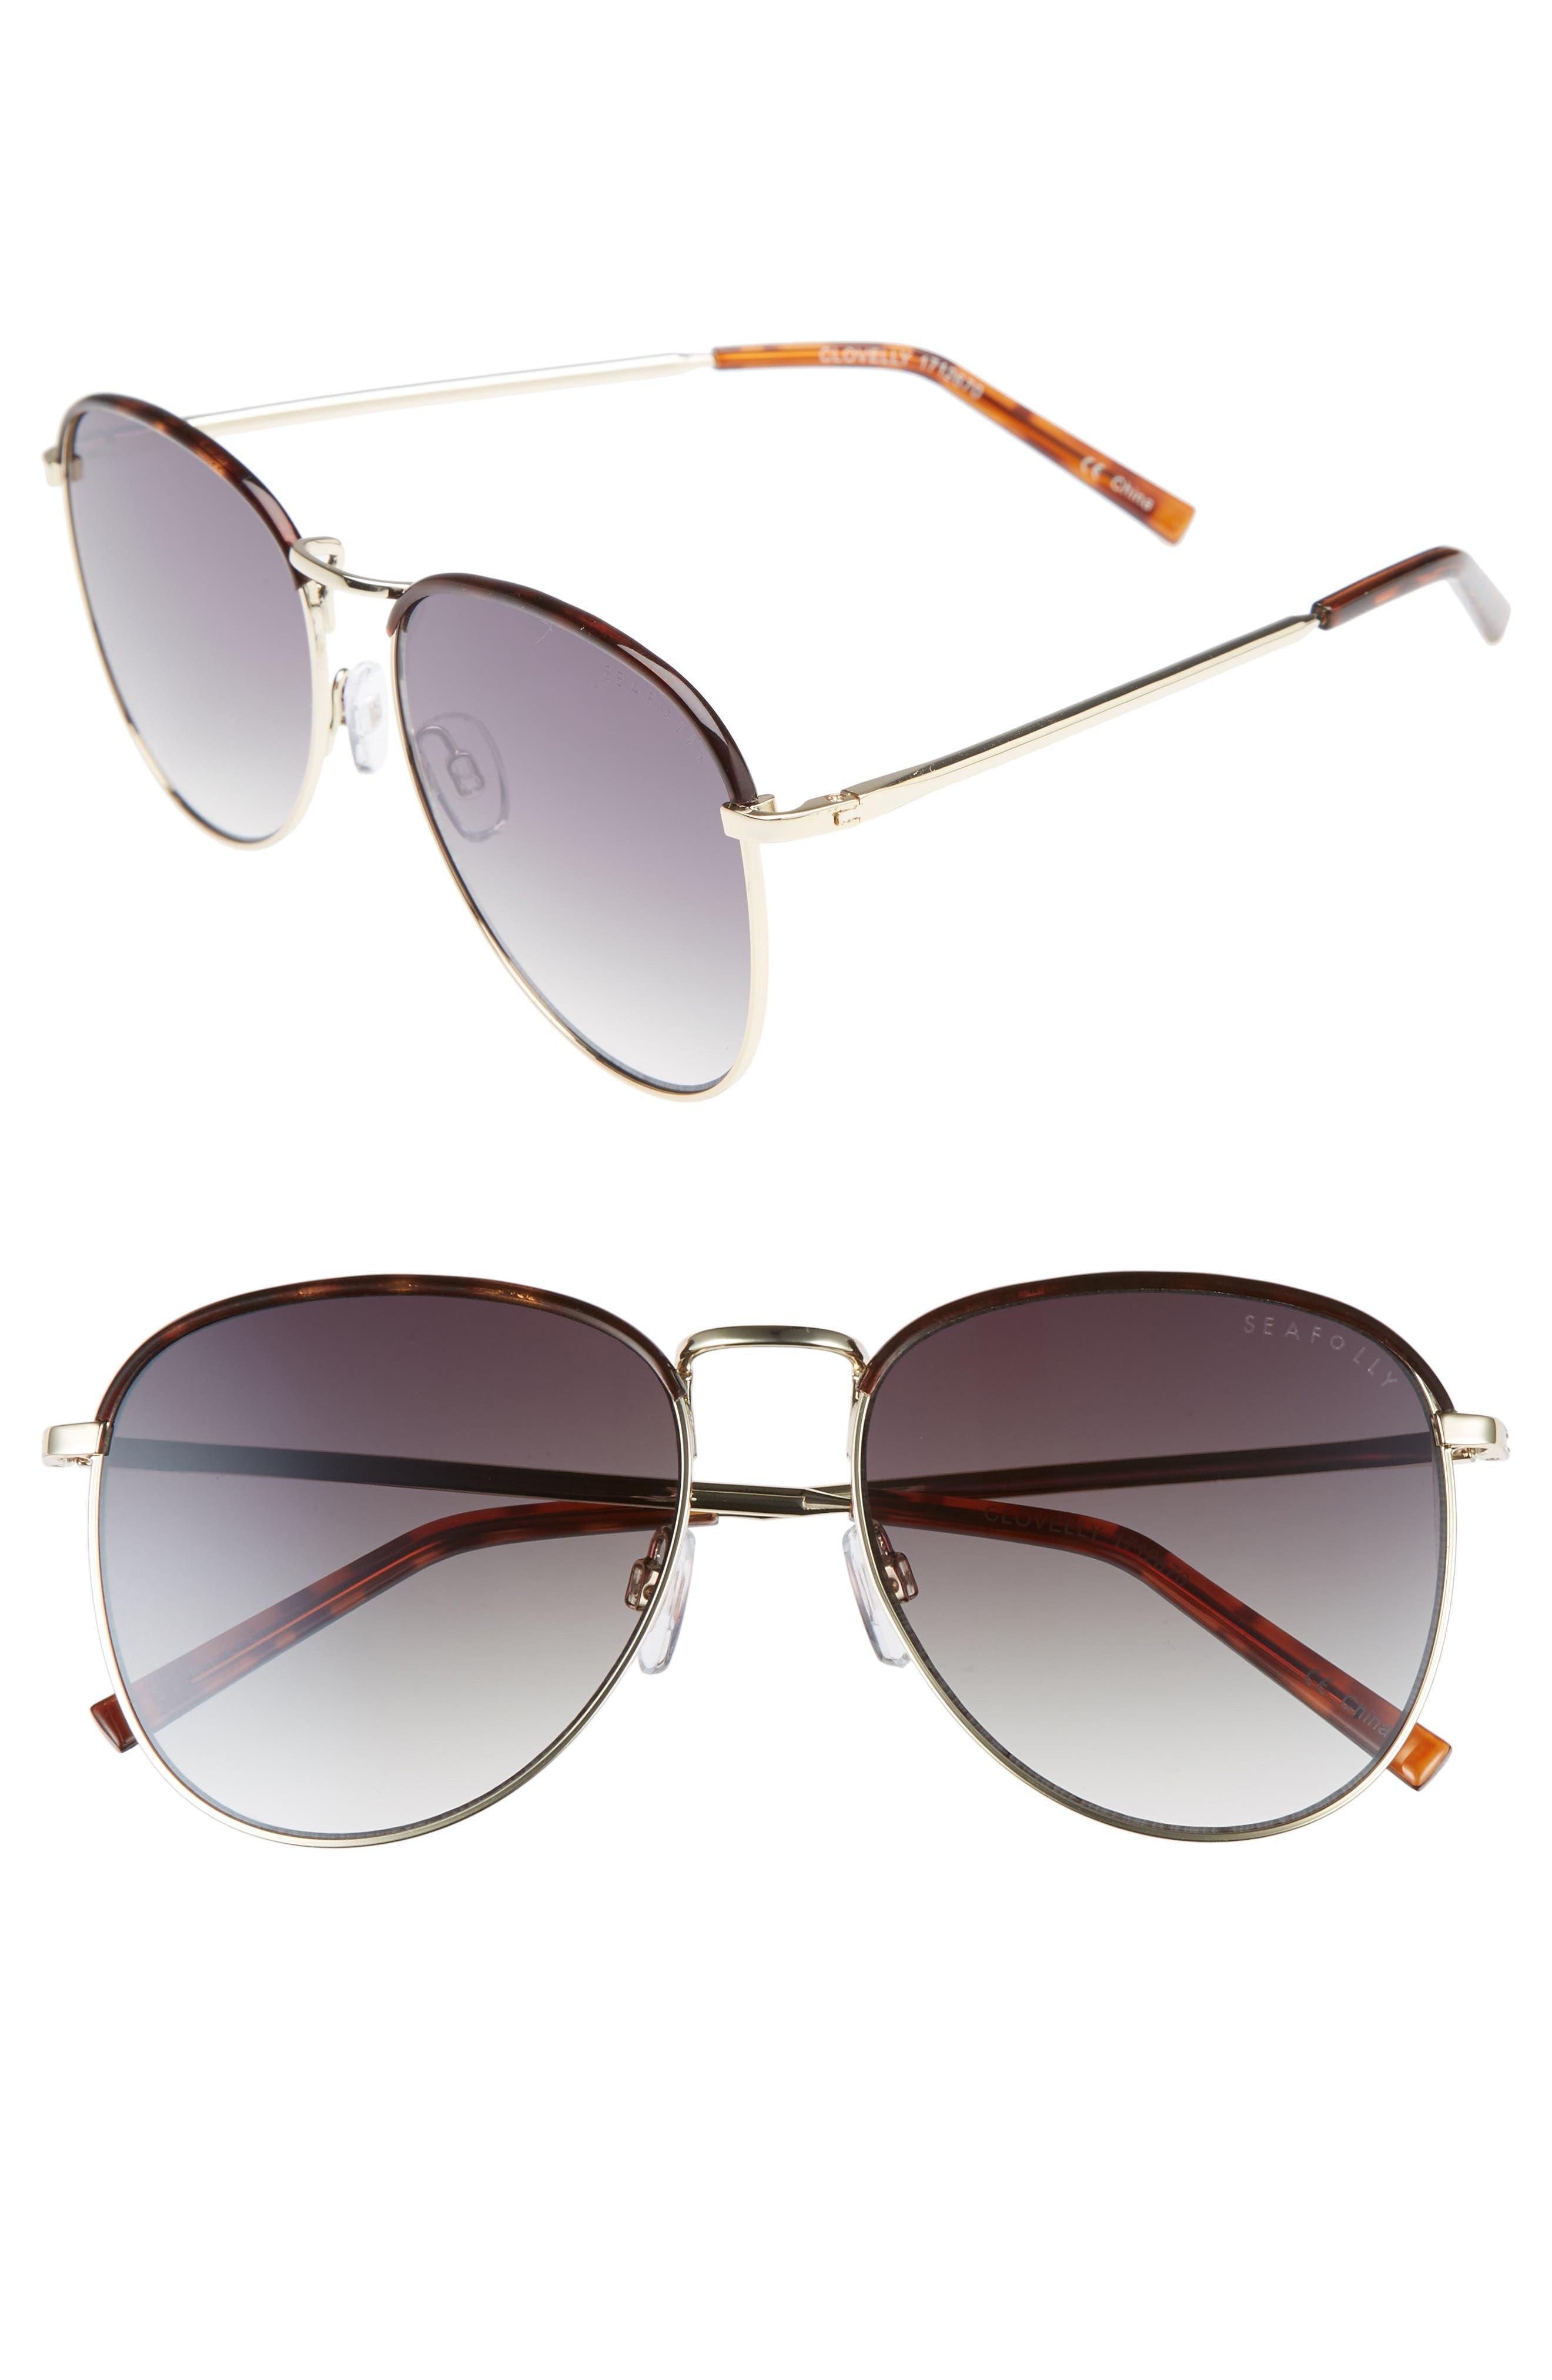 Clovelly 56mm Metal Sunglasses,                         Main,                         color, DARK TORT